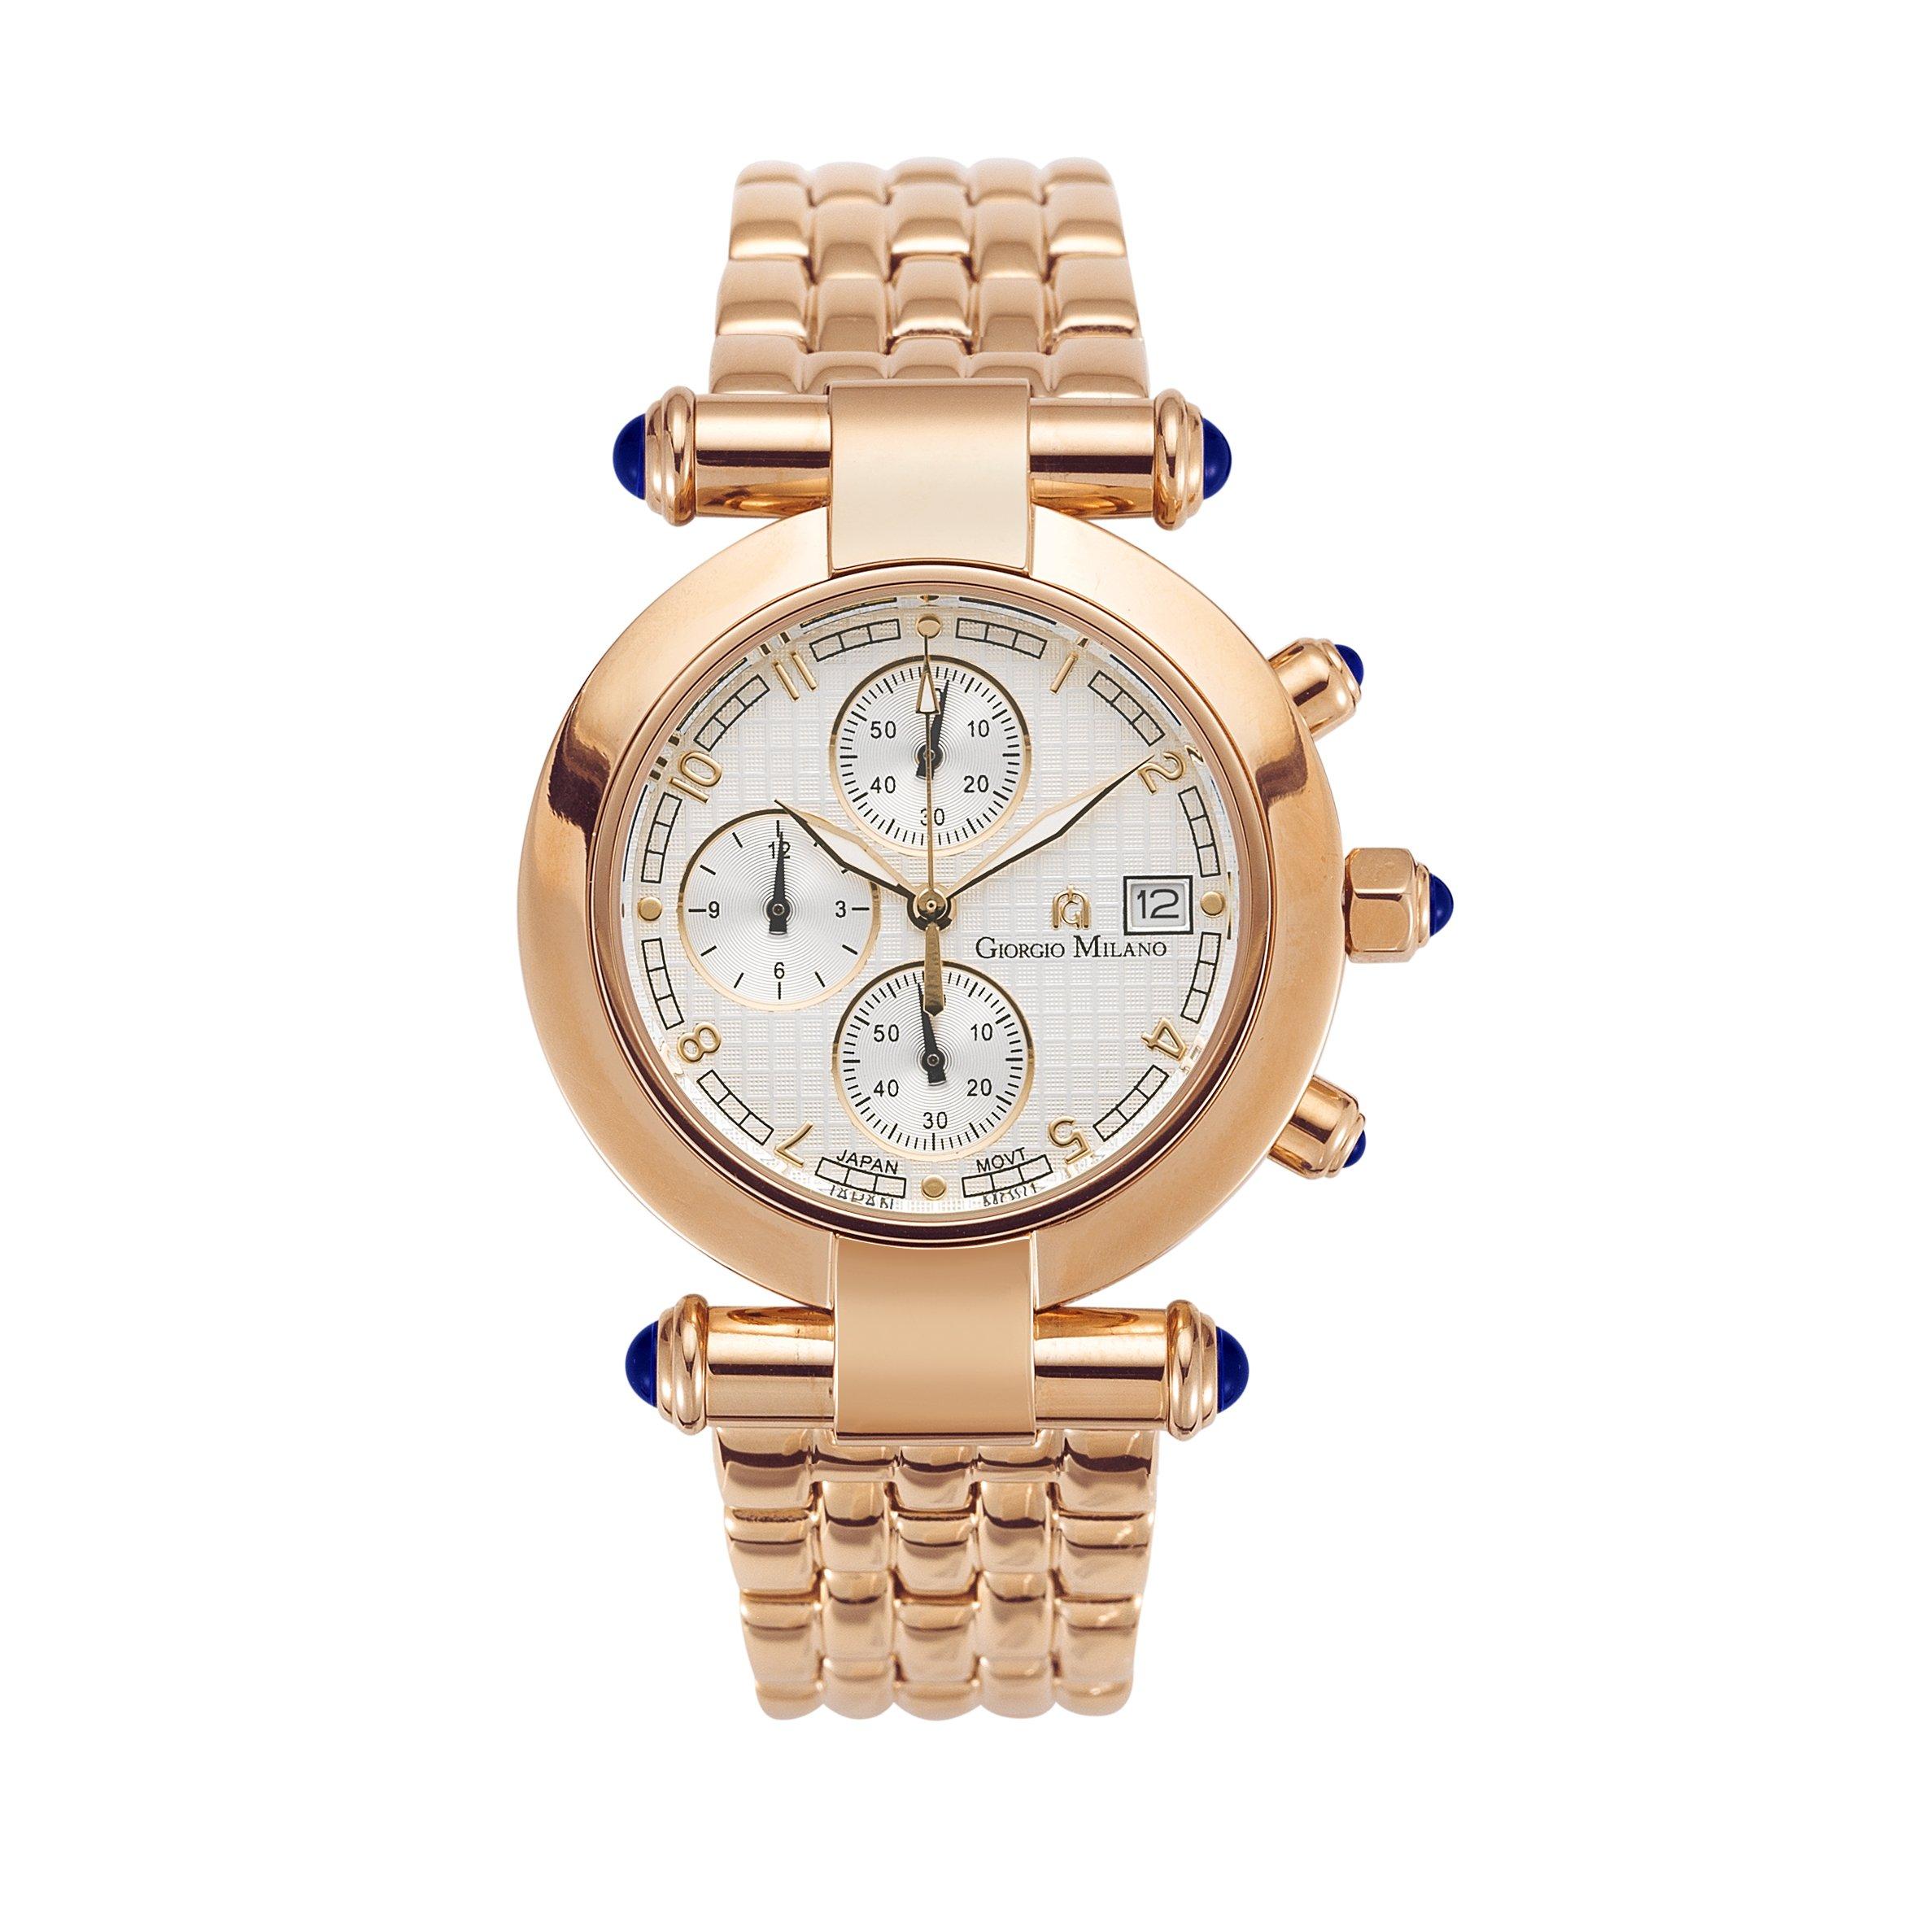 Giorgio Milano 931RG02 ''Lucia'' Women's IP Rose Gold Chronograph with Blue Stones Slim Watch